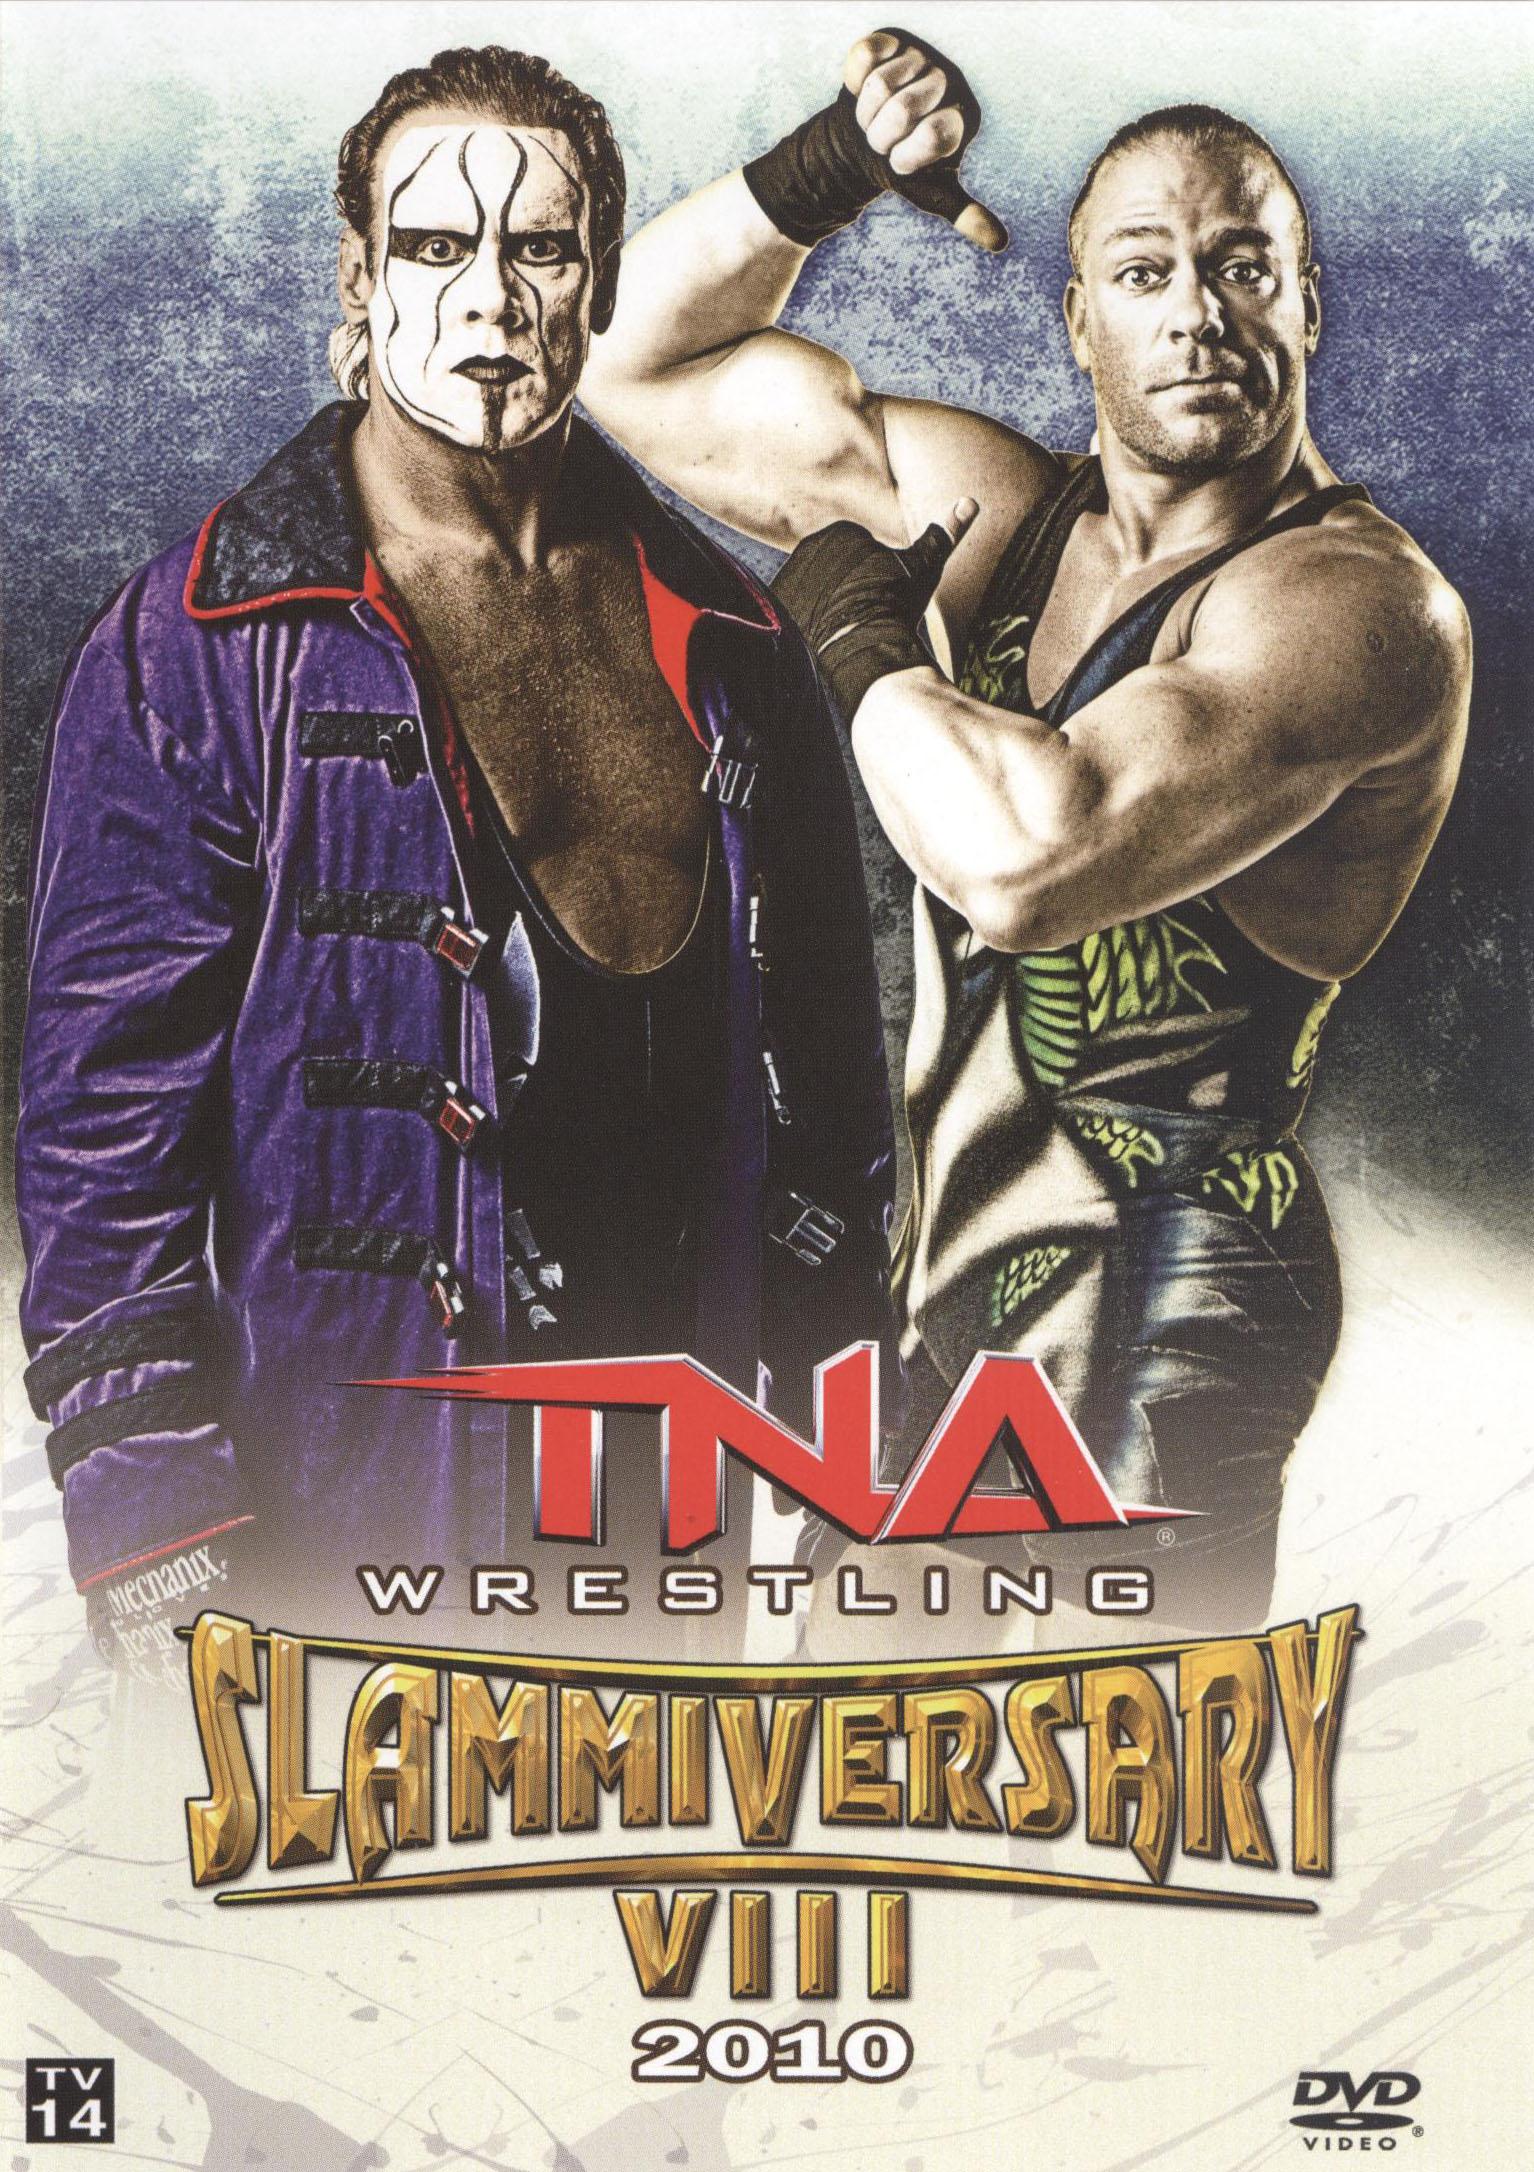 TNA Wrestling: Slammiversary 2010